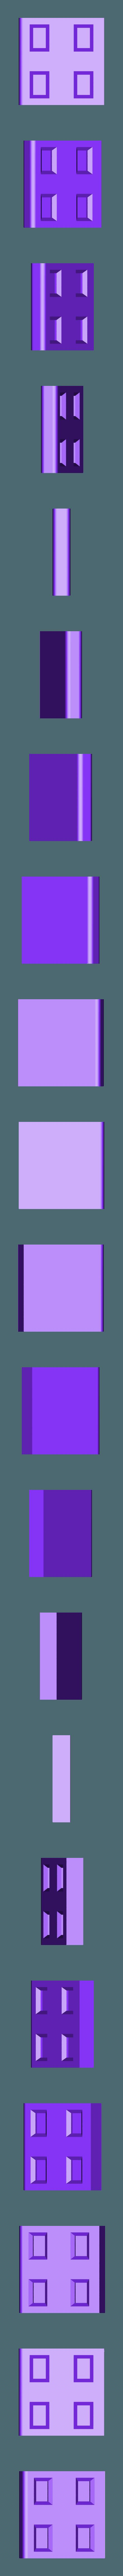 window_2_1.stl Download STL file SD card storage • 3D printing model, Florisam